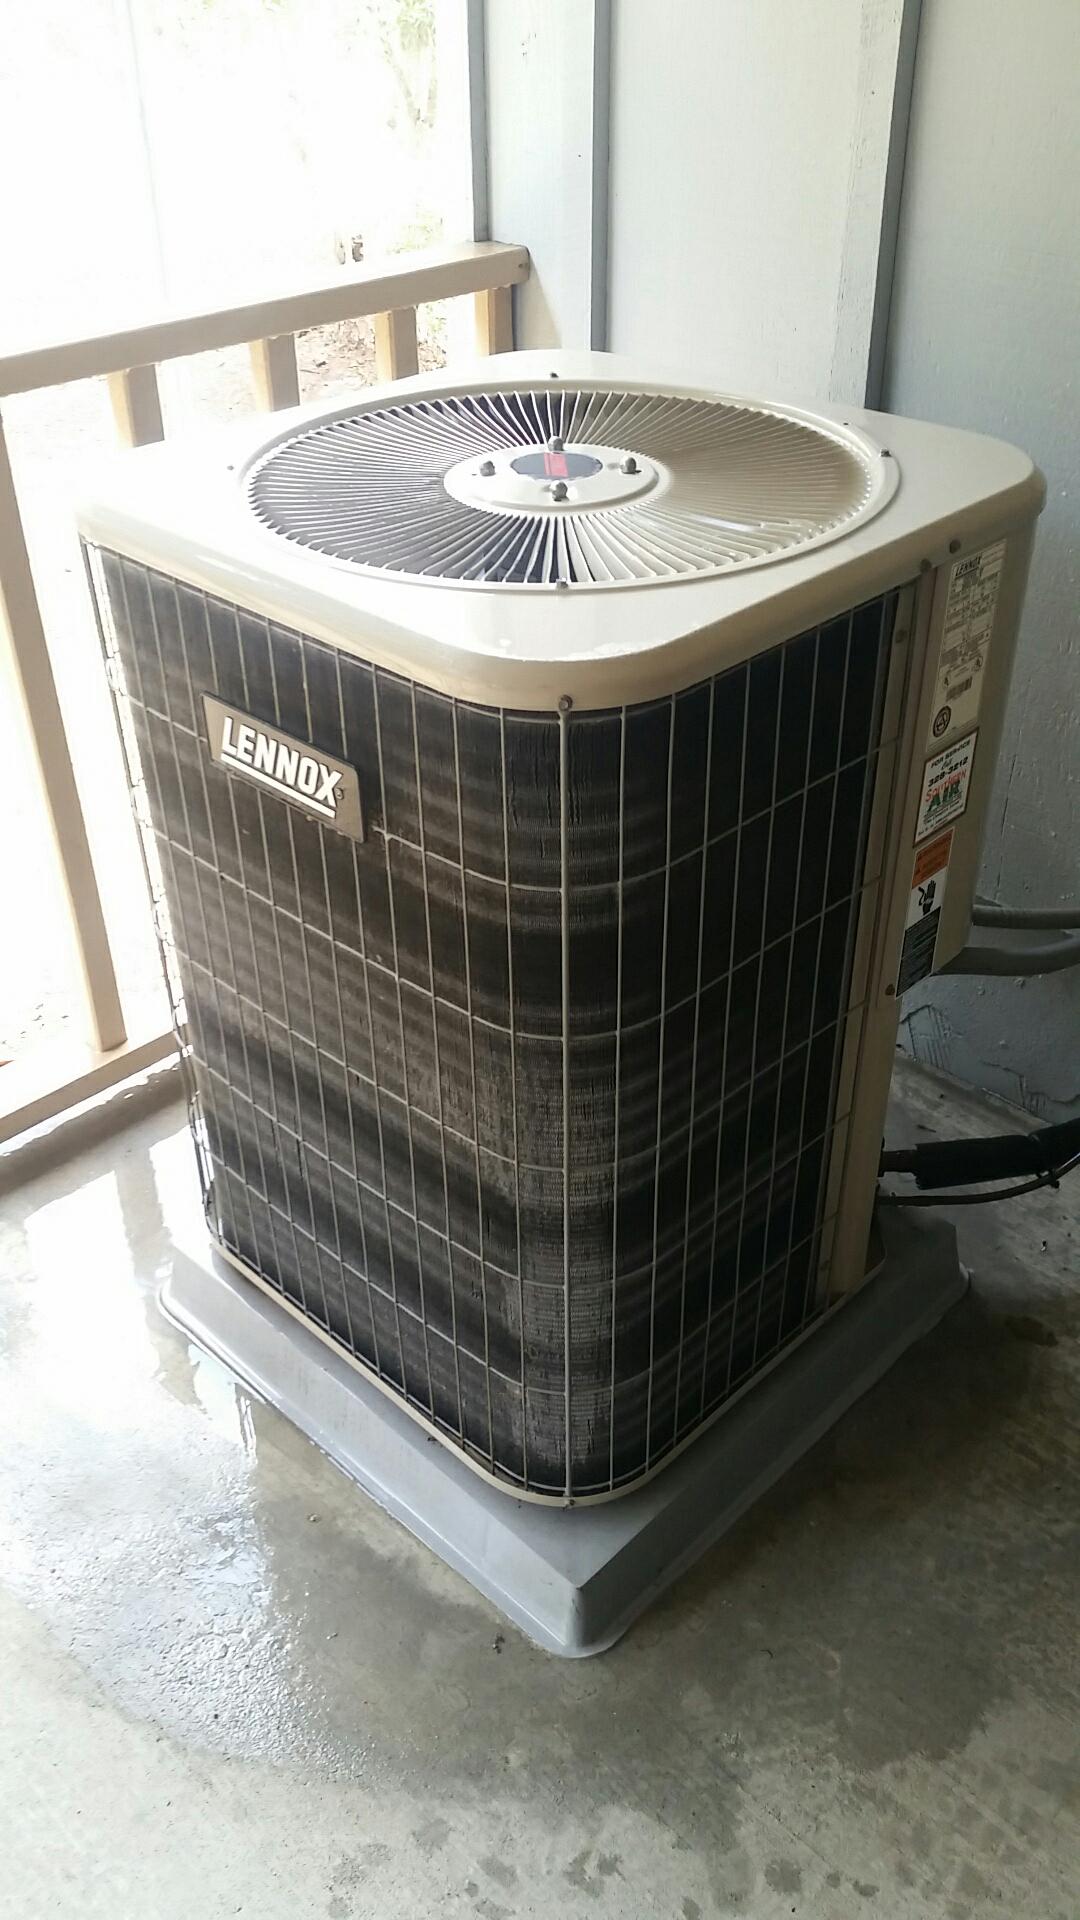 Crescent City, FL - Maintenance on Lennox split heat pump system